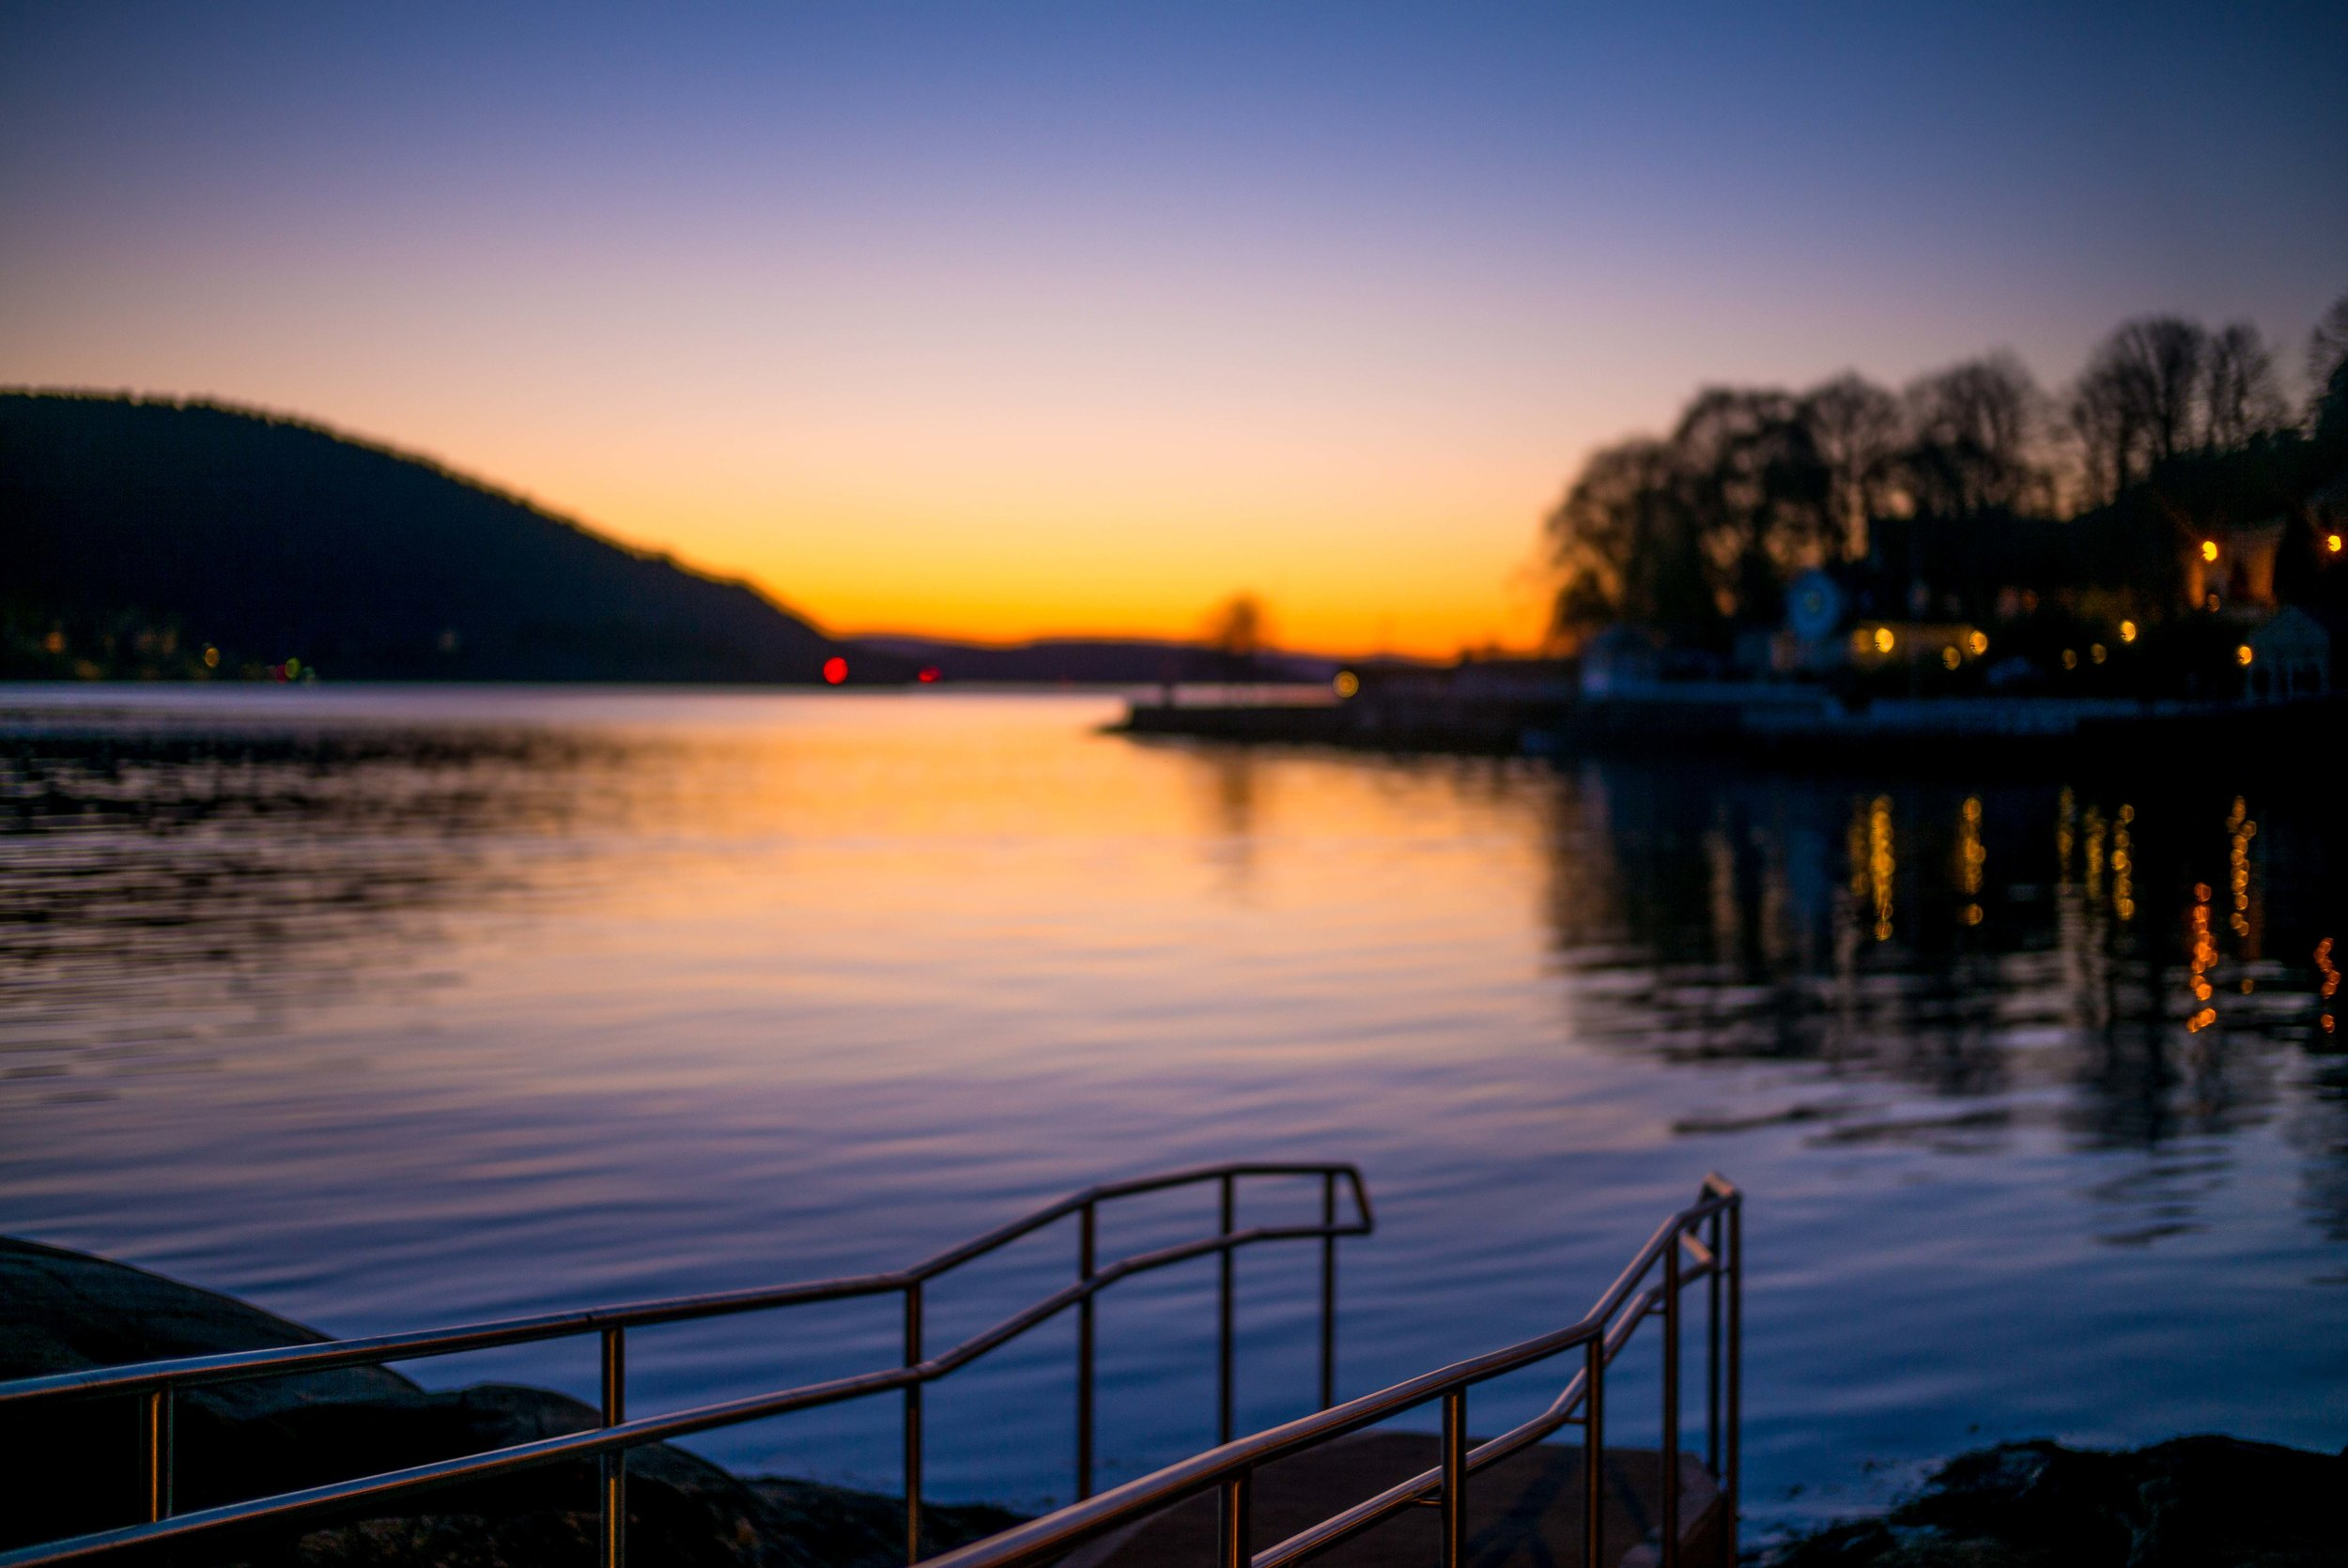 Parrstranda, Drøbak by the Oslofjord. Norway. Photo: Daniel Novello